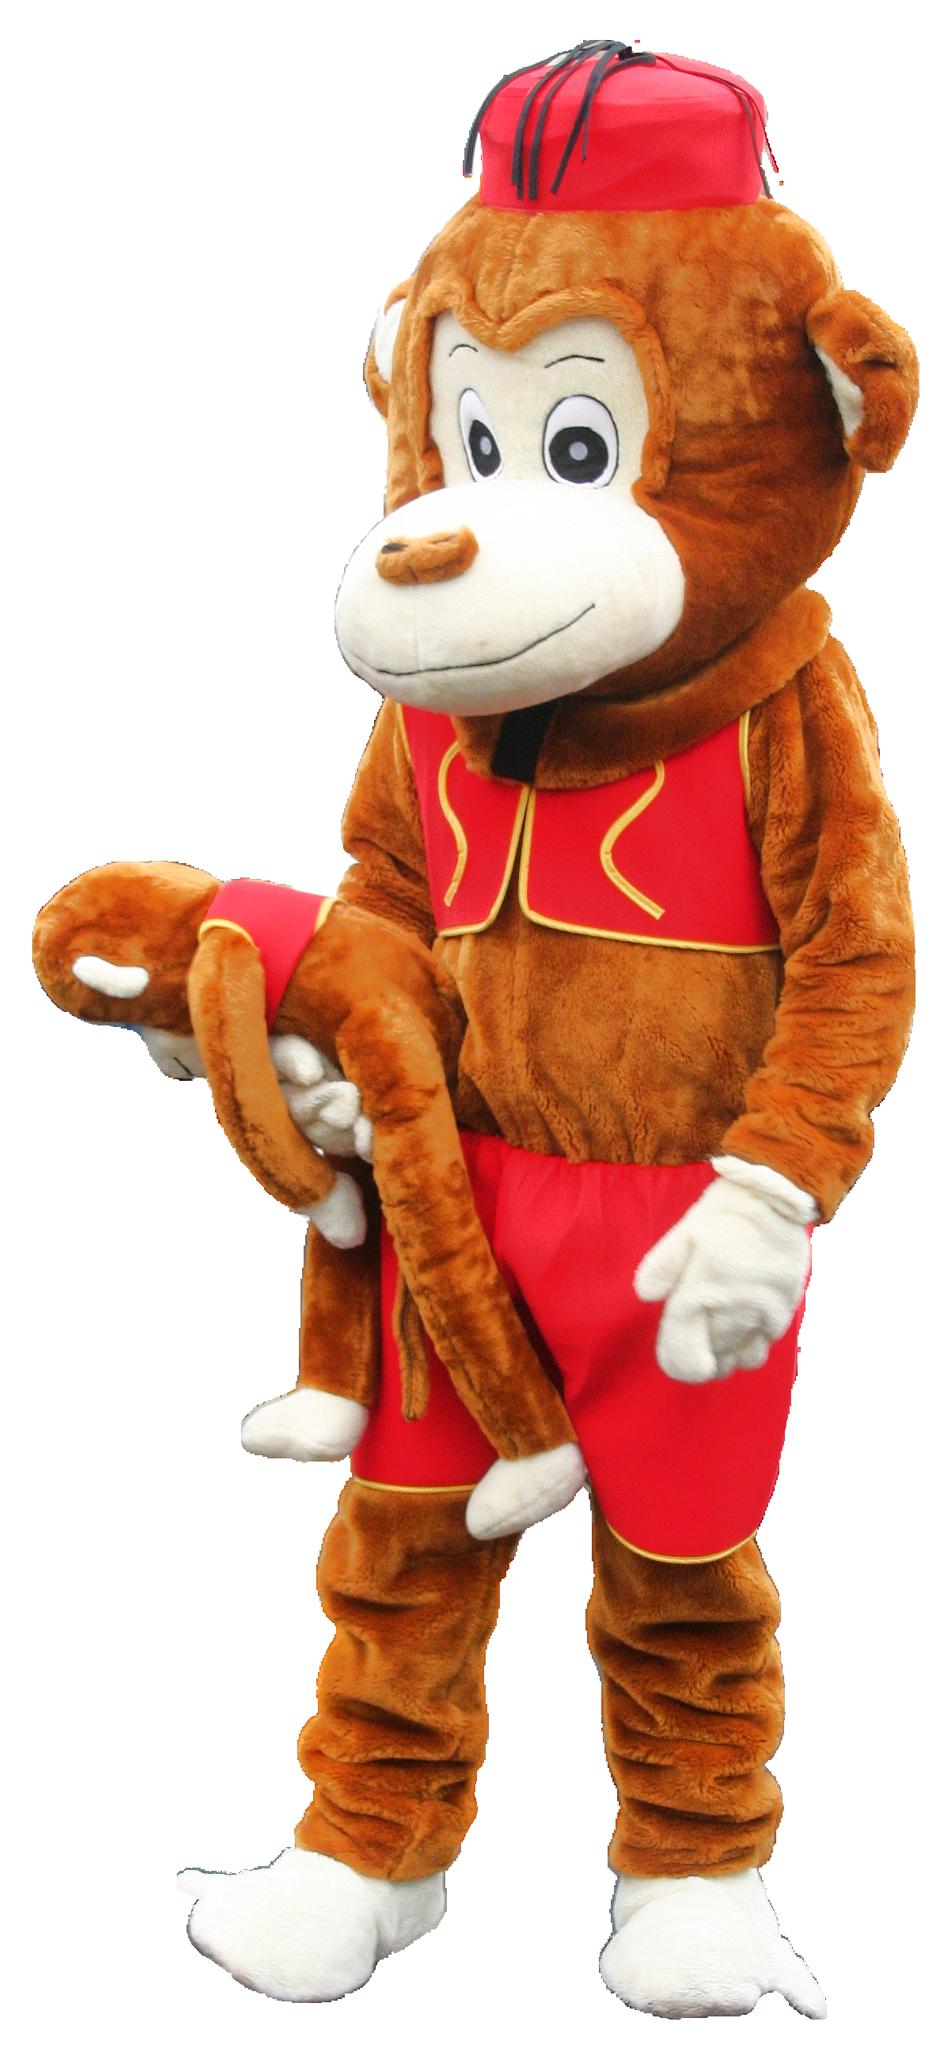 Monkey Toy PNG Transparent Im